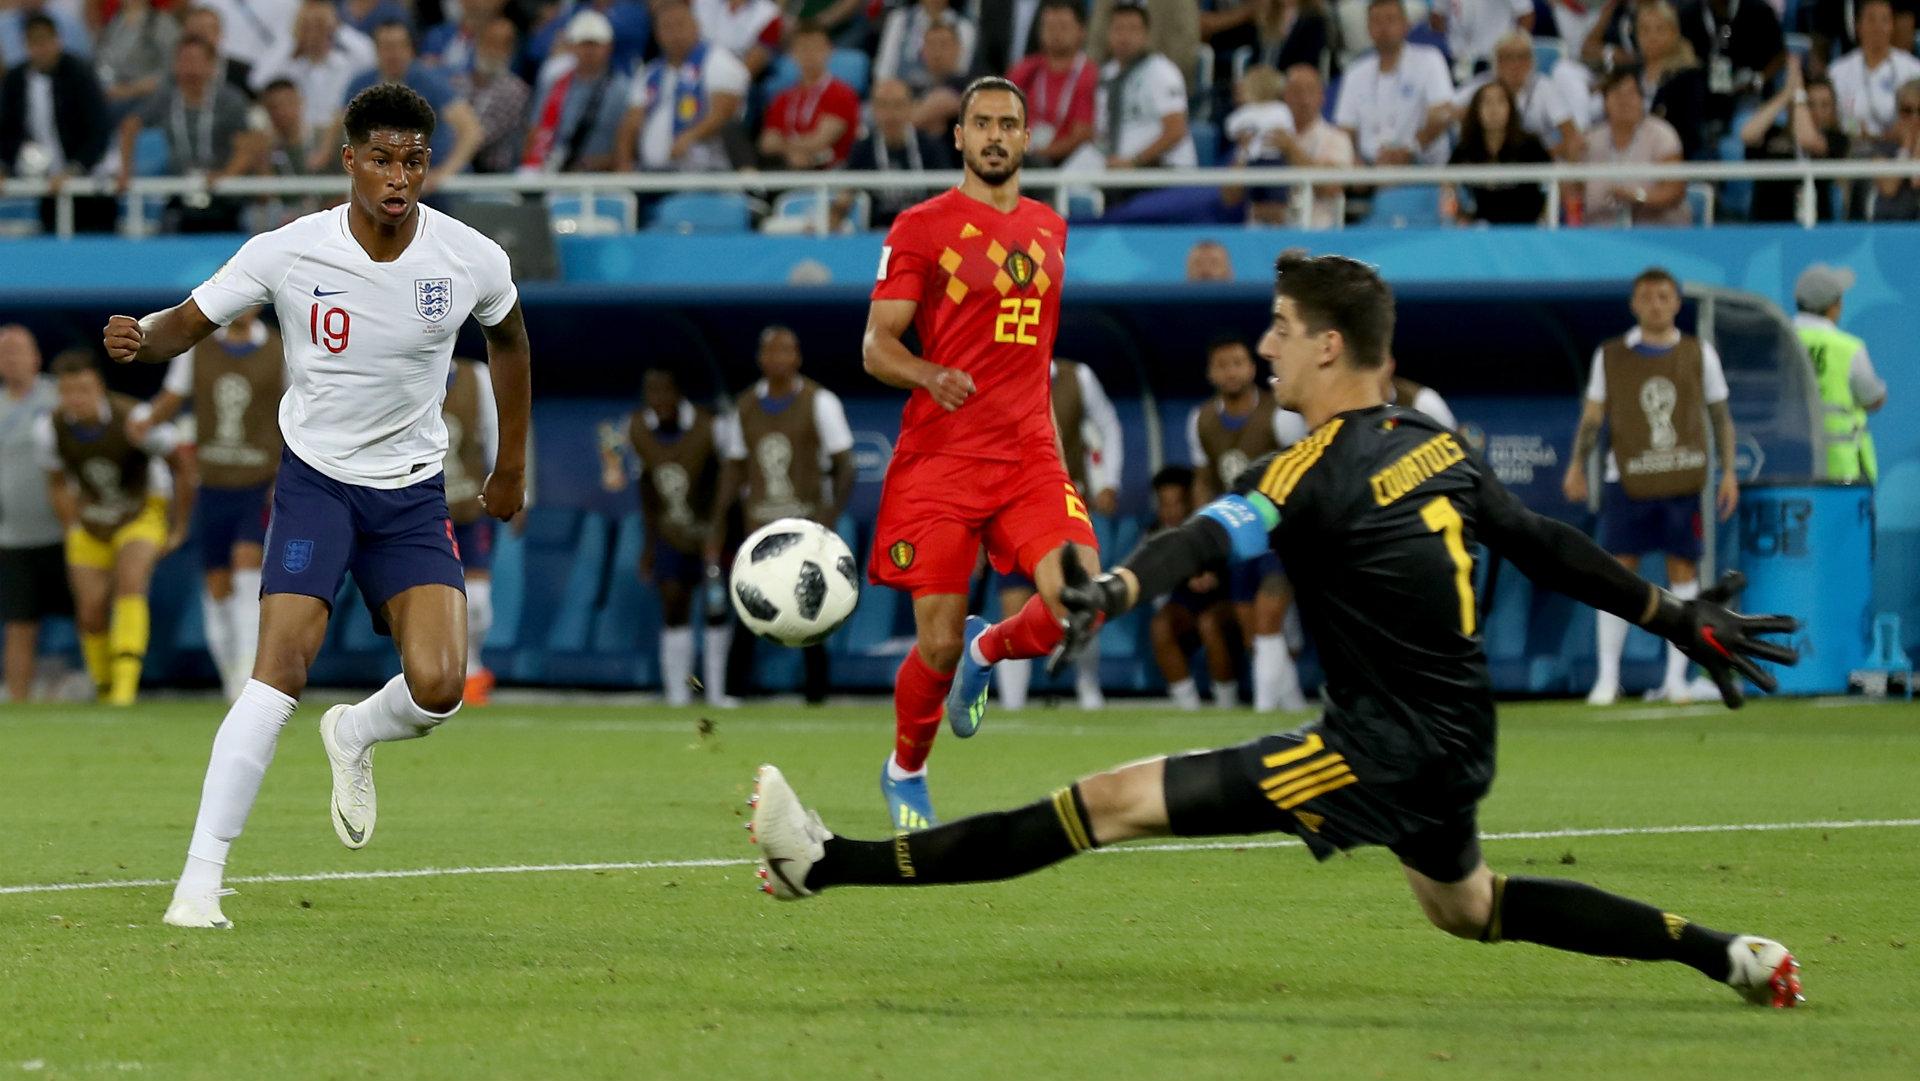 Marcus Rashford England Belgium World Cup 2018